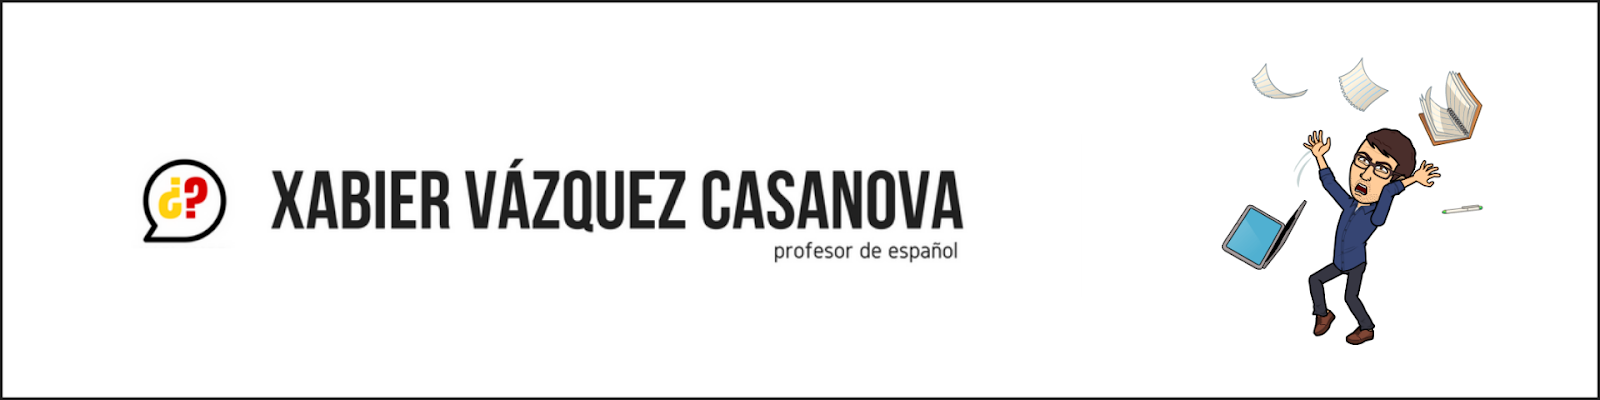 xabiervazquezcasanova